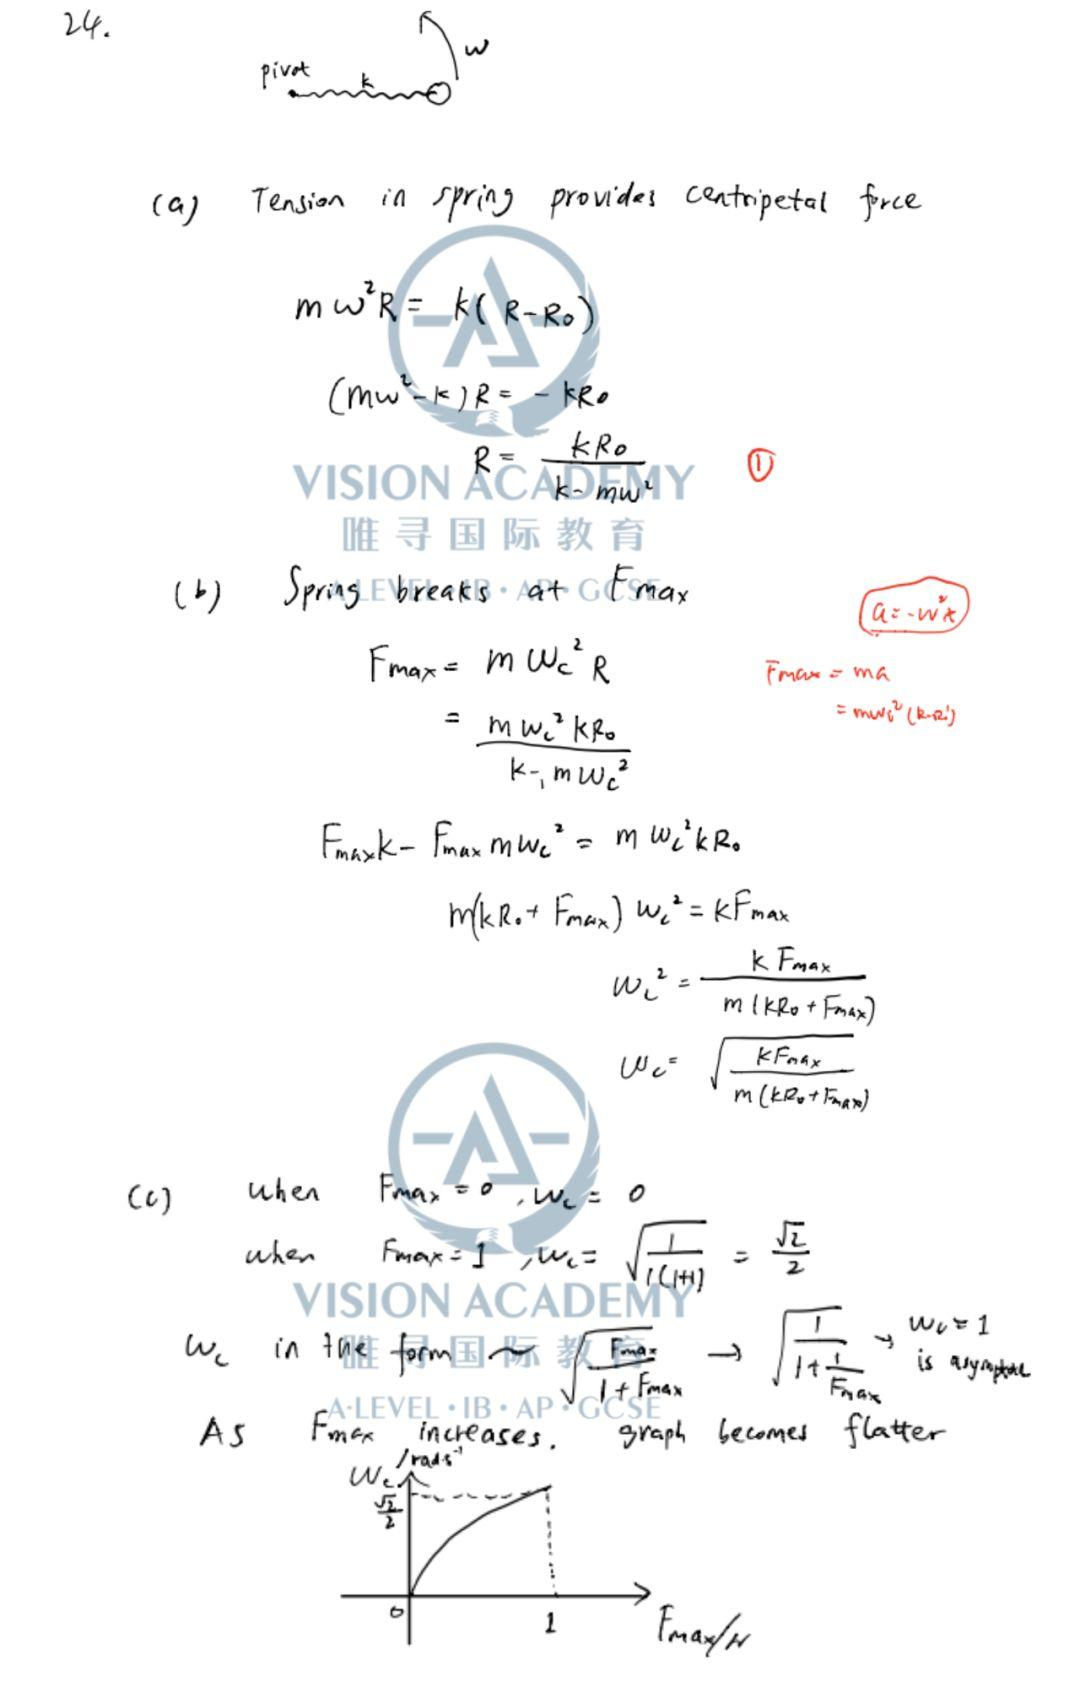 PAT2019最全真题+天团解析+考情分析来了! 自评快看  牛津大学 考试 竞赛 第36张